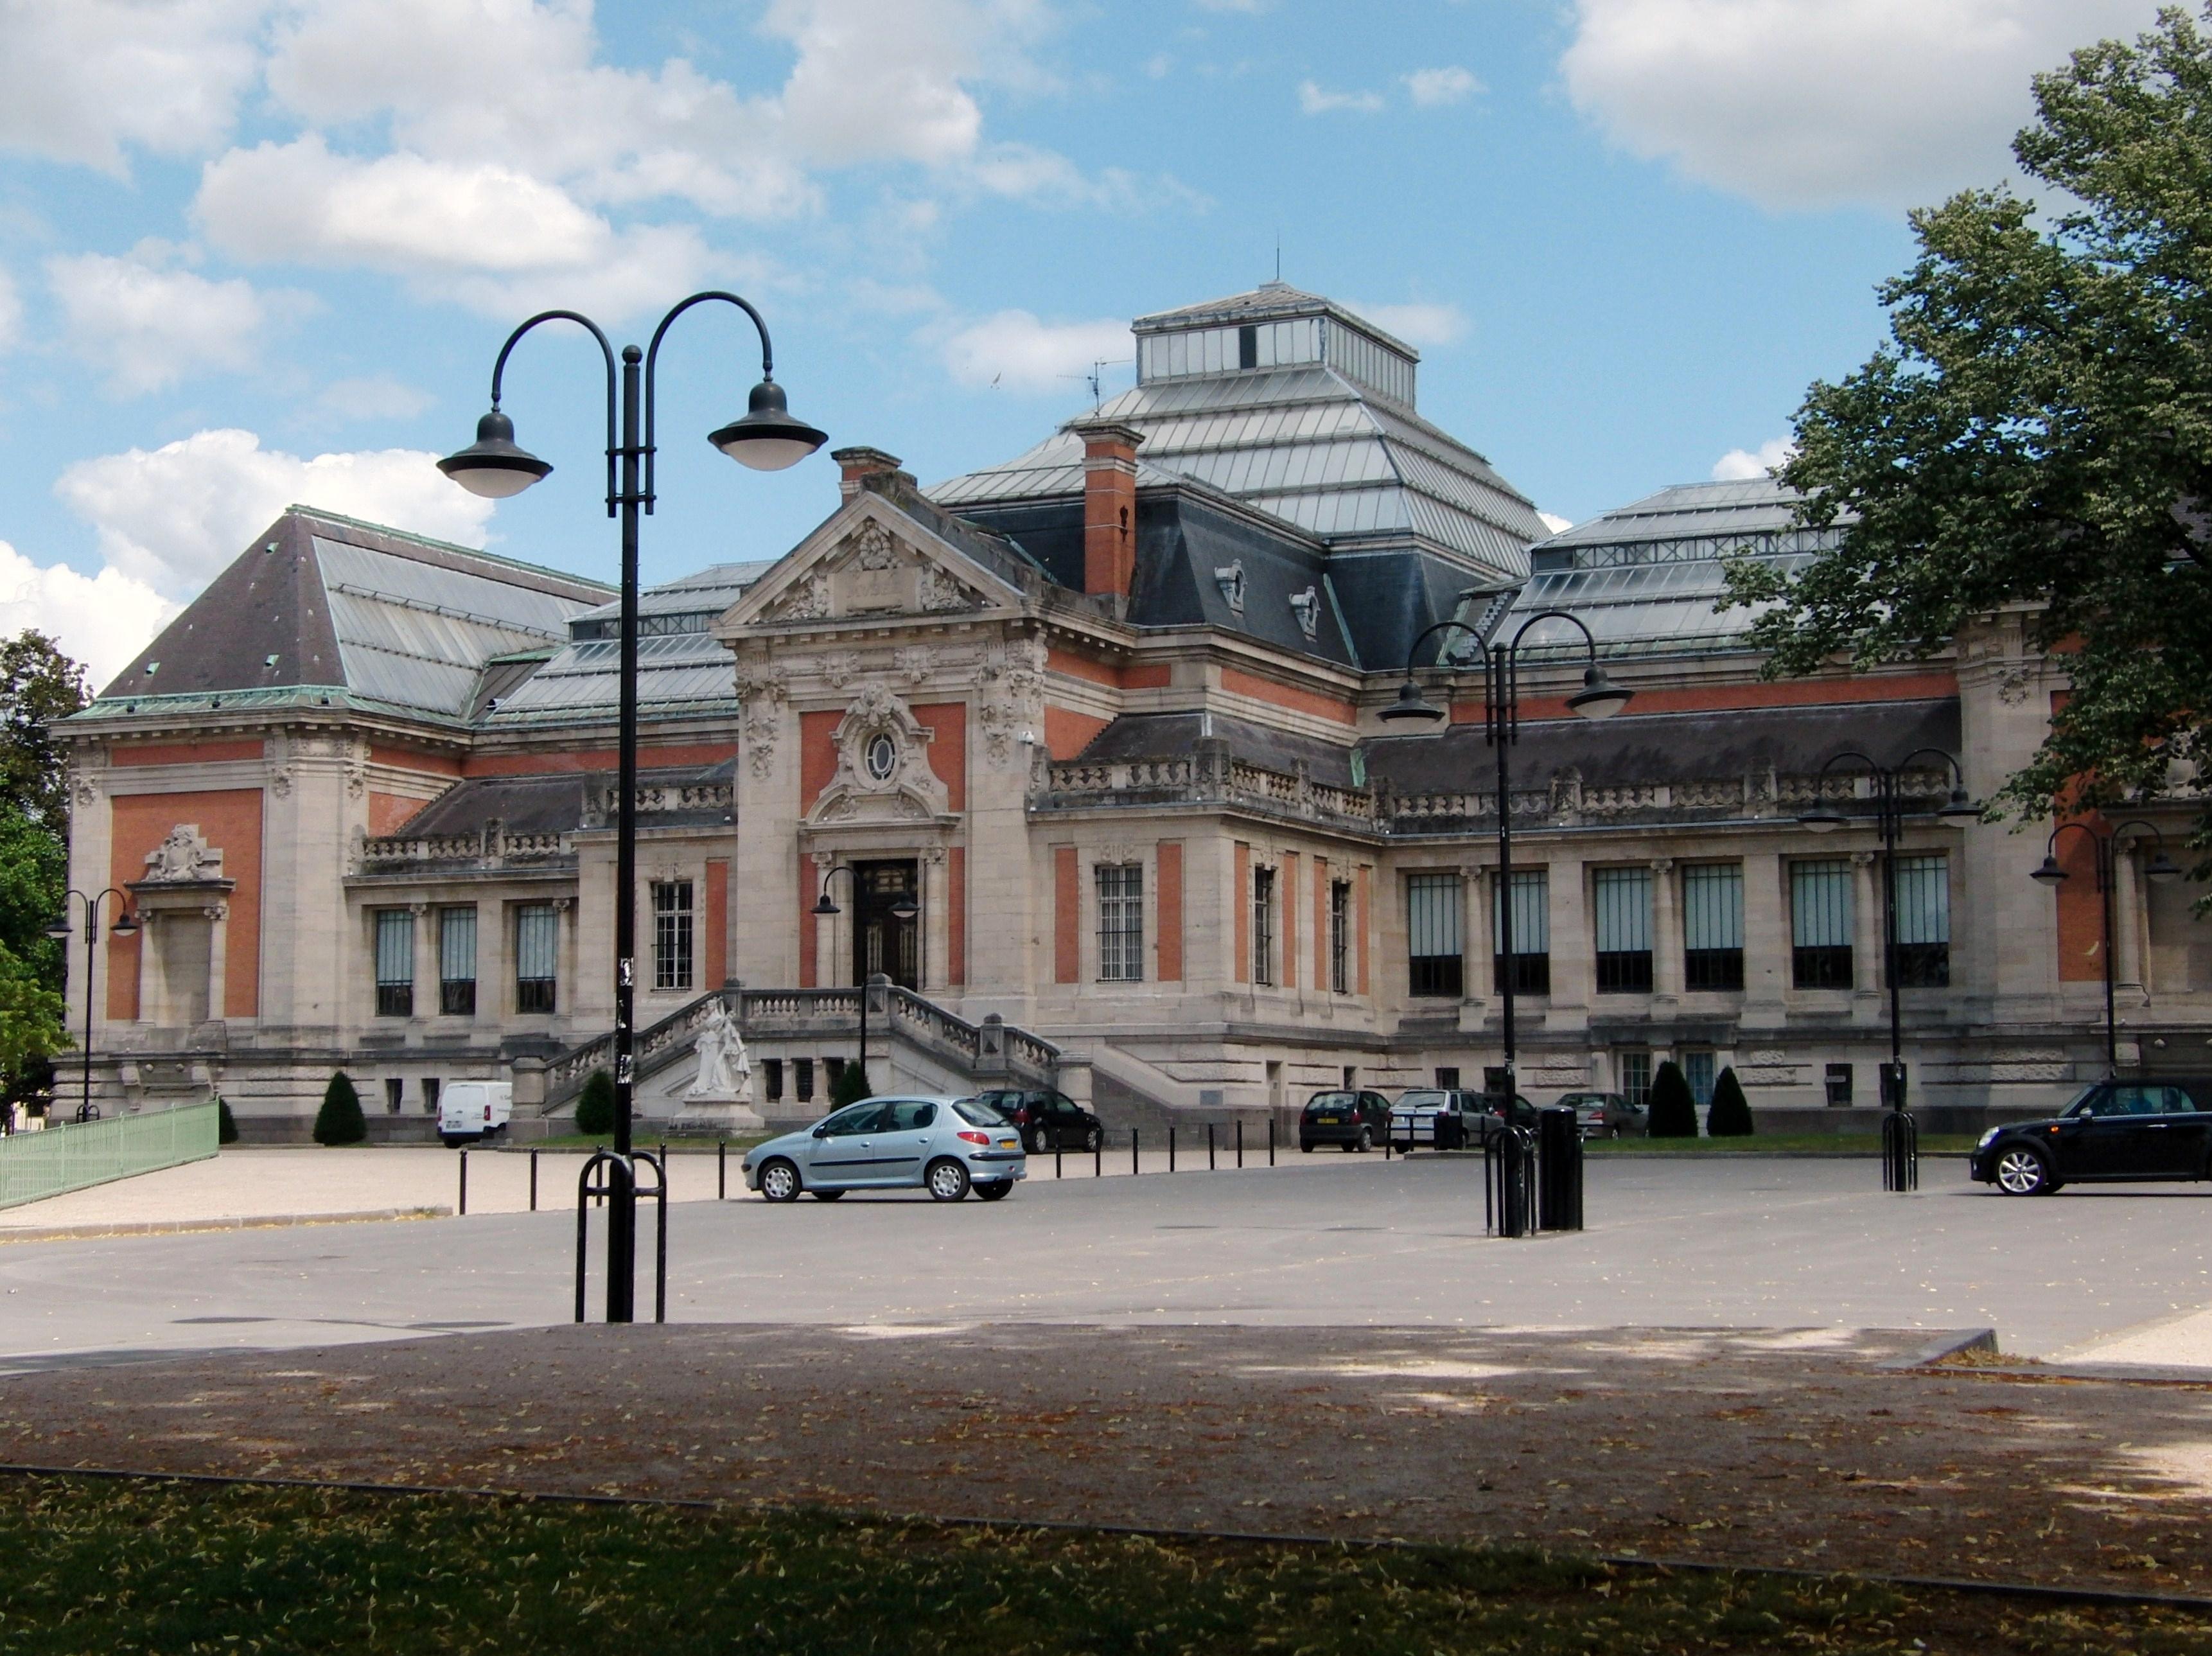 263-valenciennes_facade_du_musee_des_beaux-arts.jpg